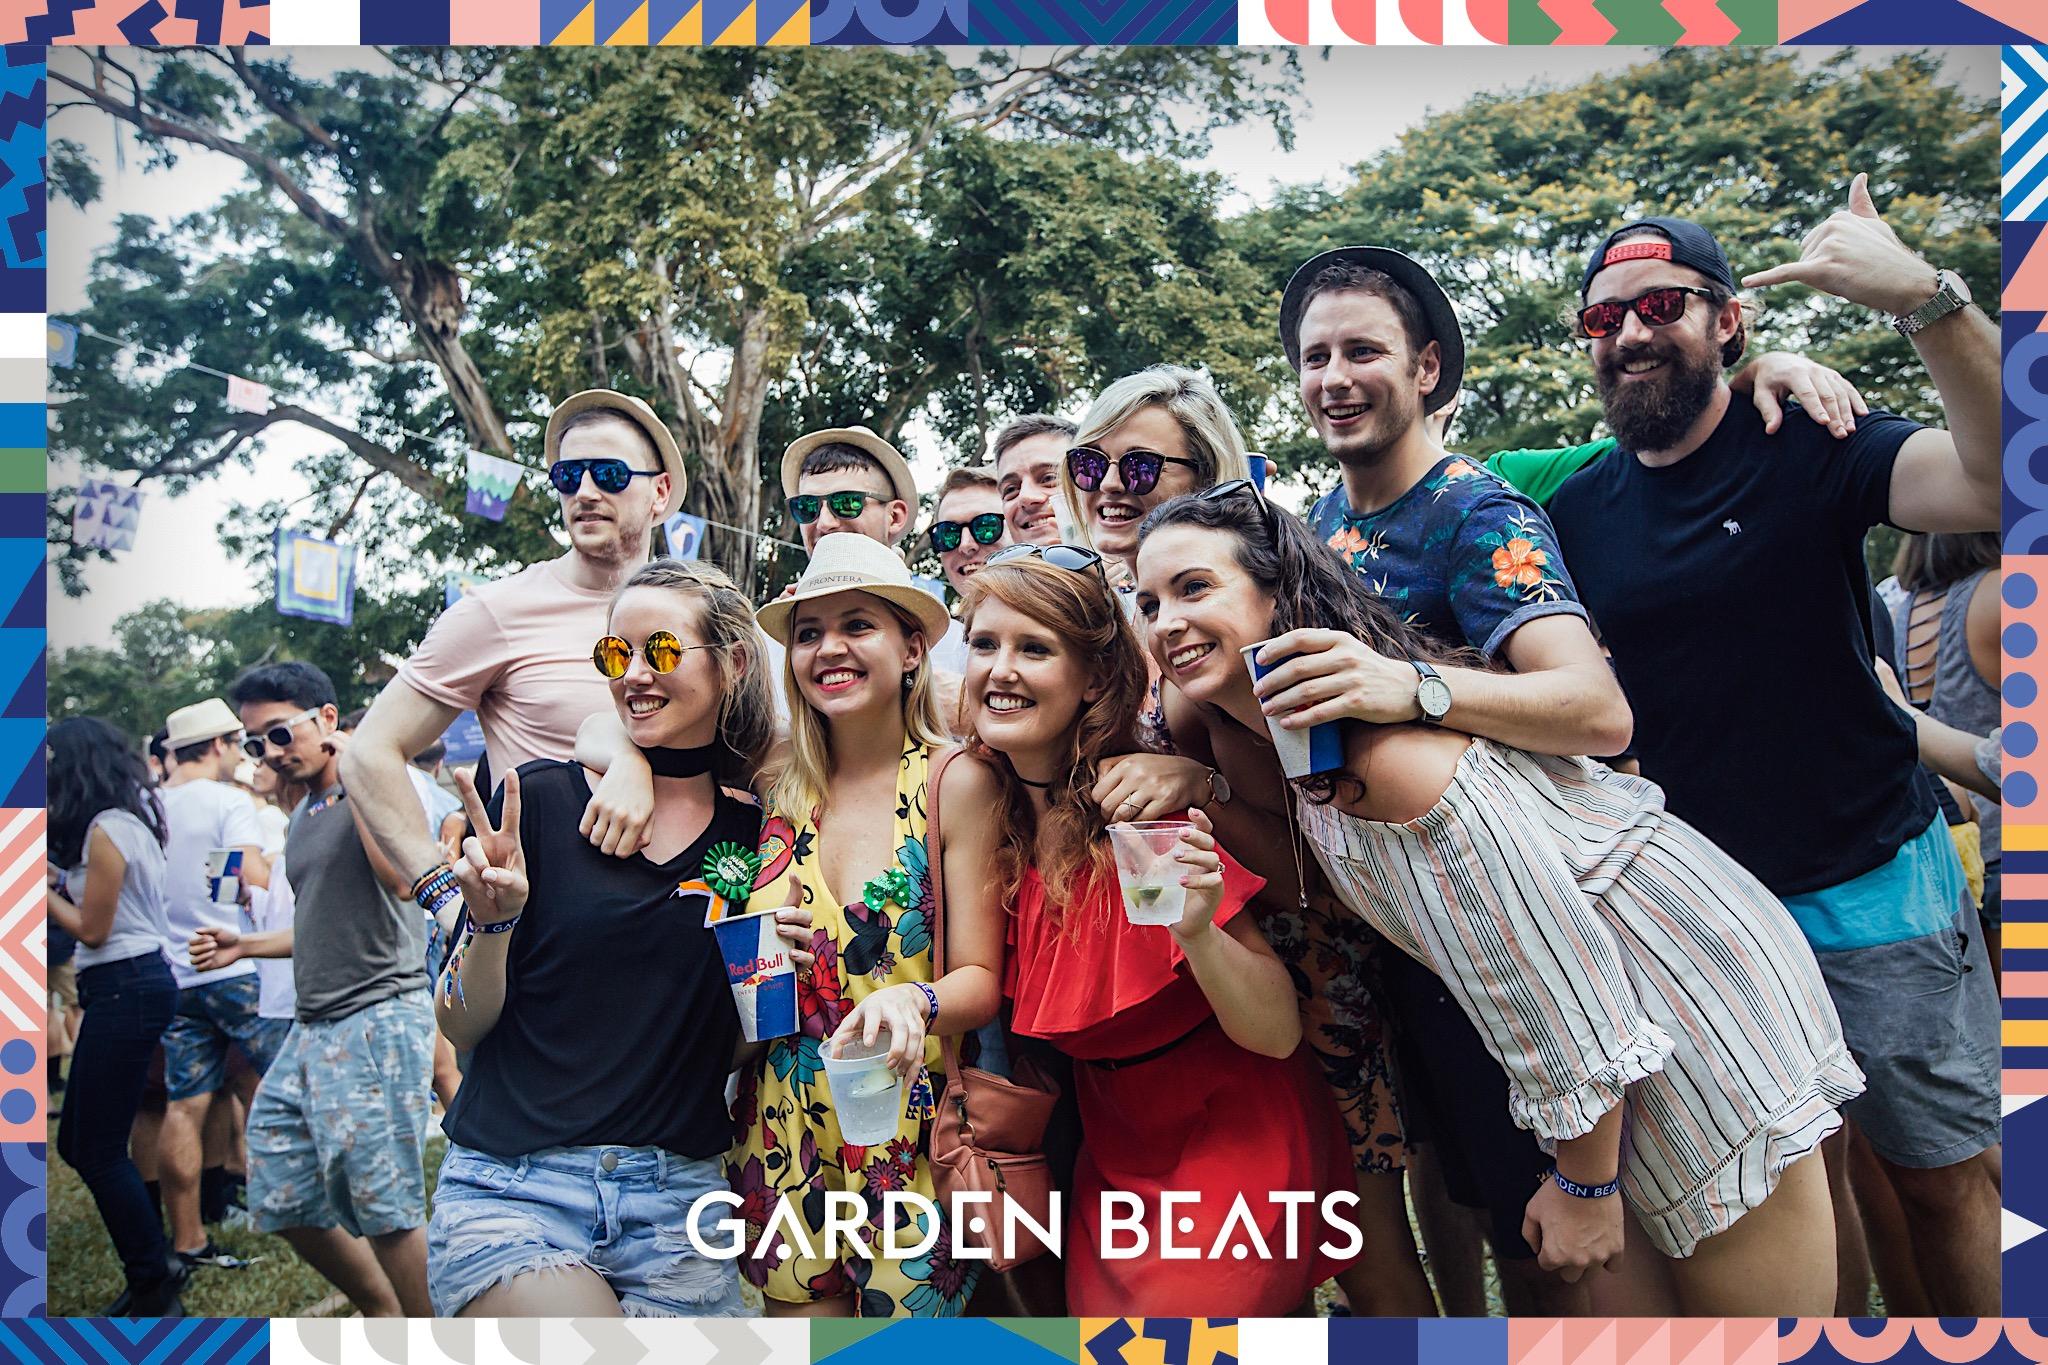 18032017_GardenBeats_Colossal569_WatermarkedGB.jpg